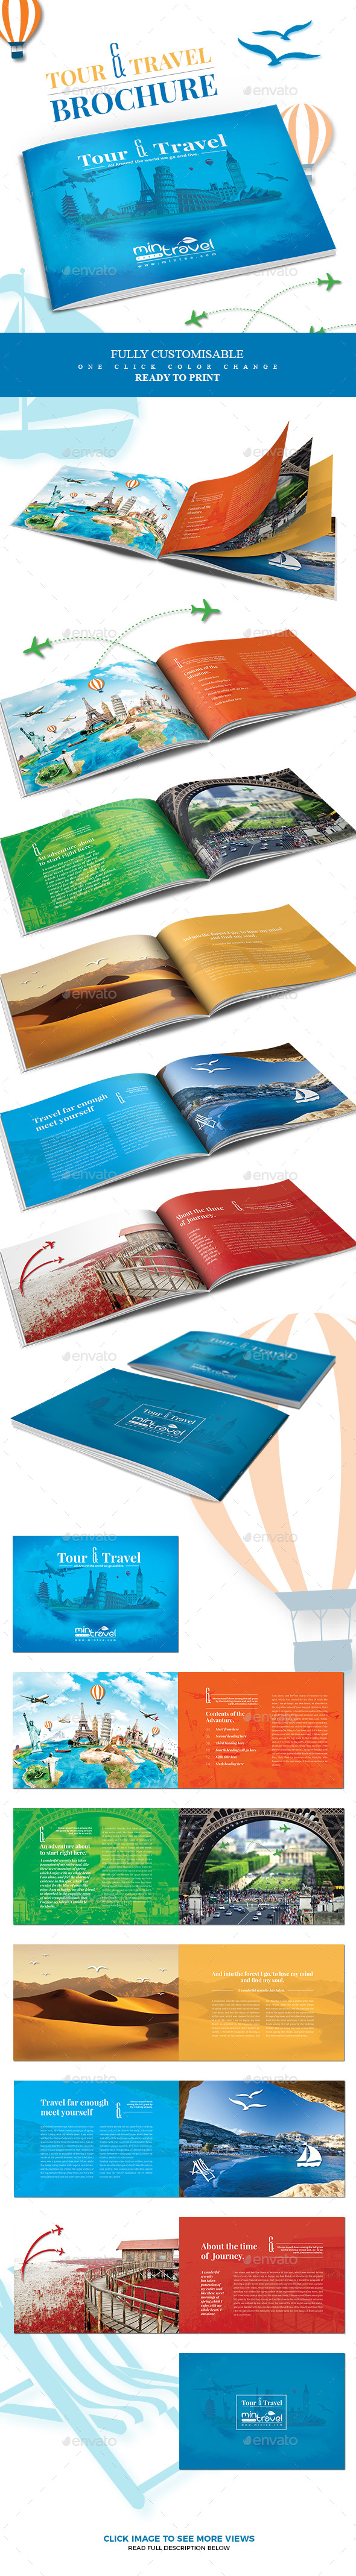 Tour and Tourism Brochure - Informational Brochures